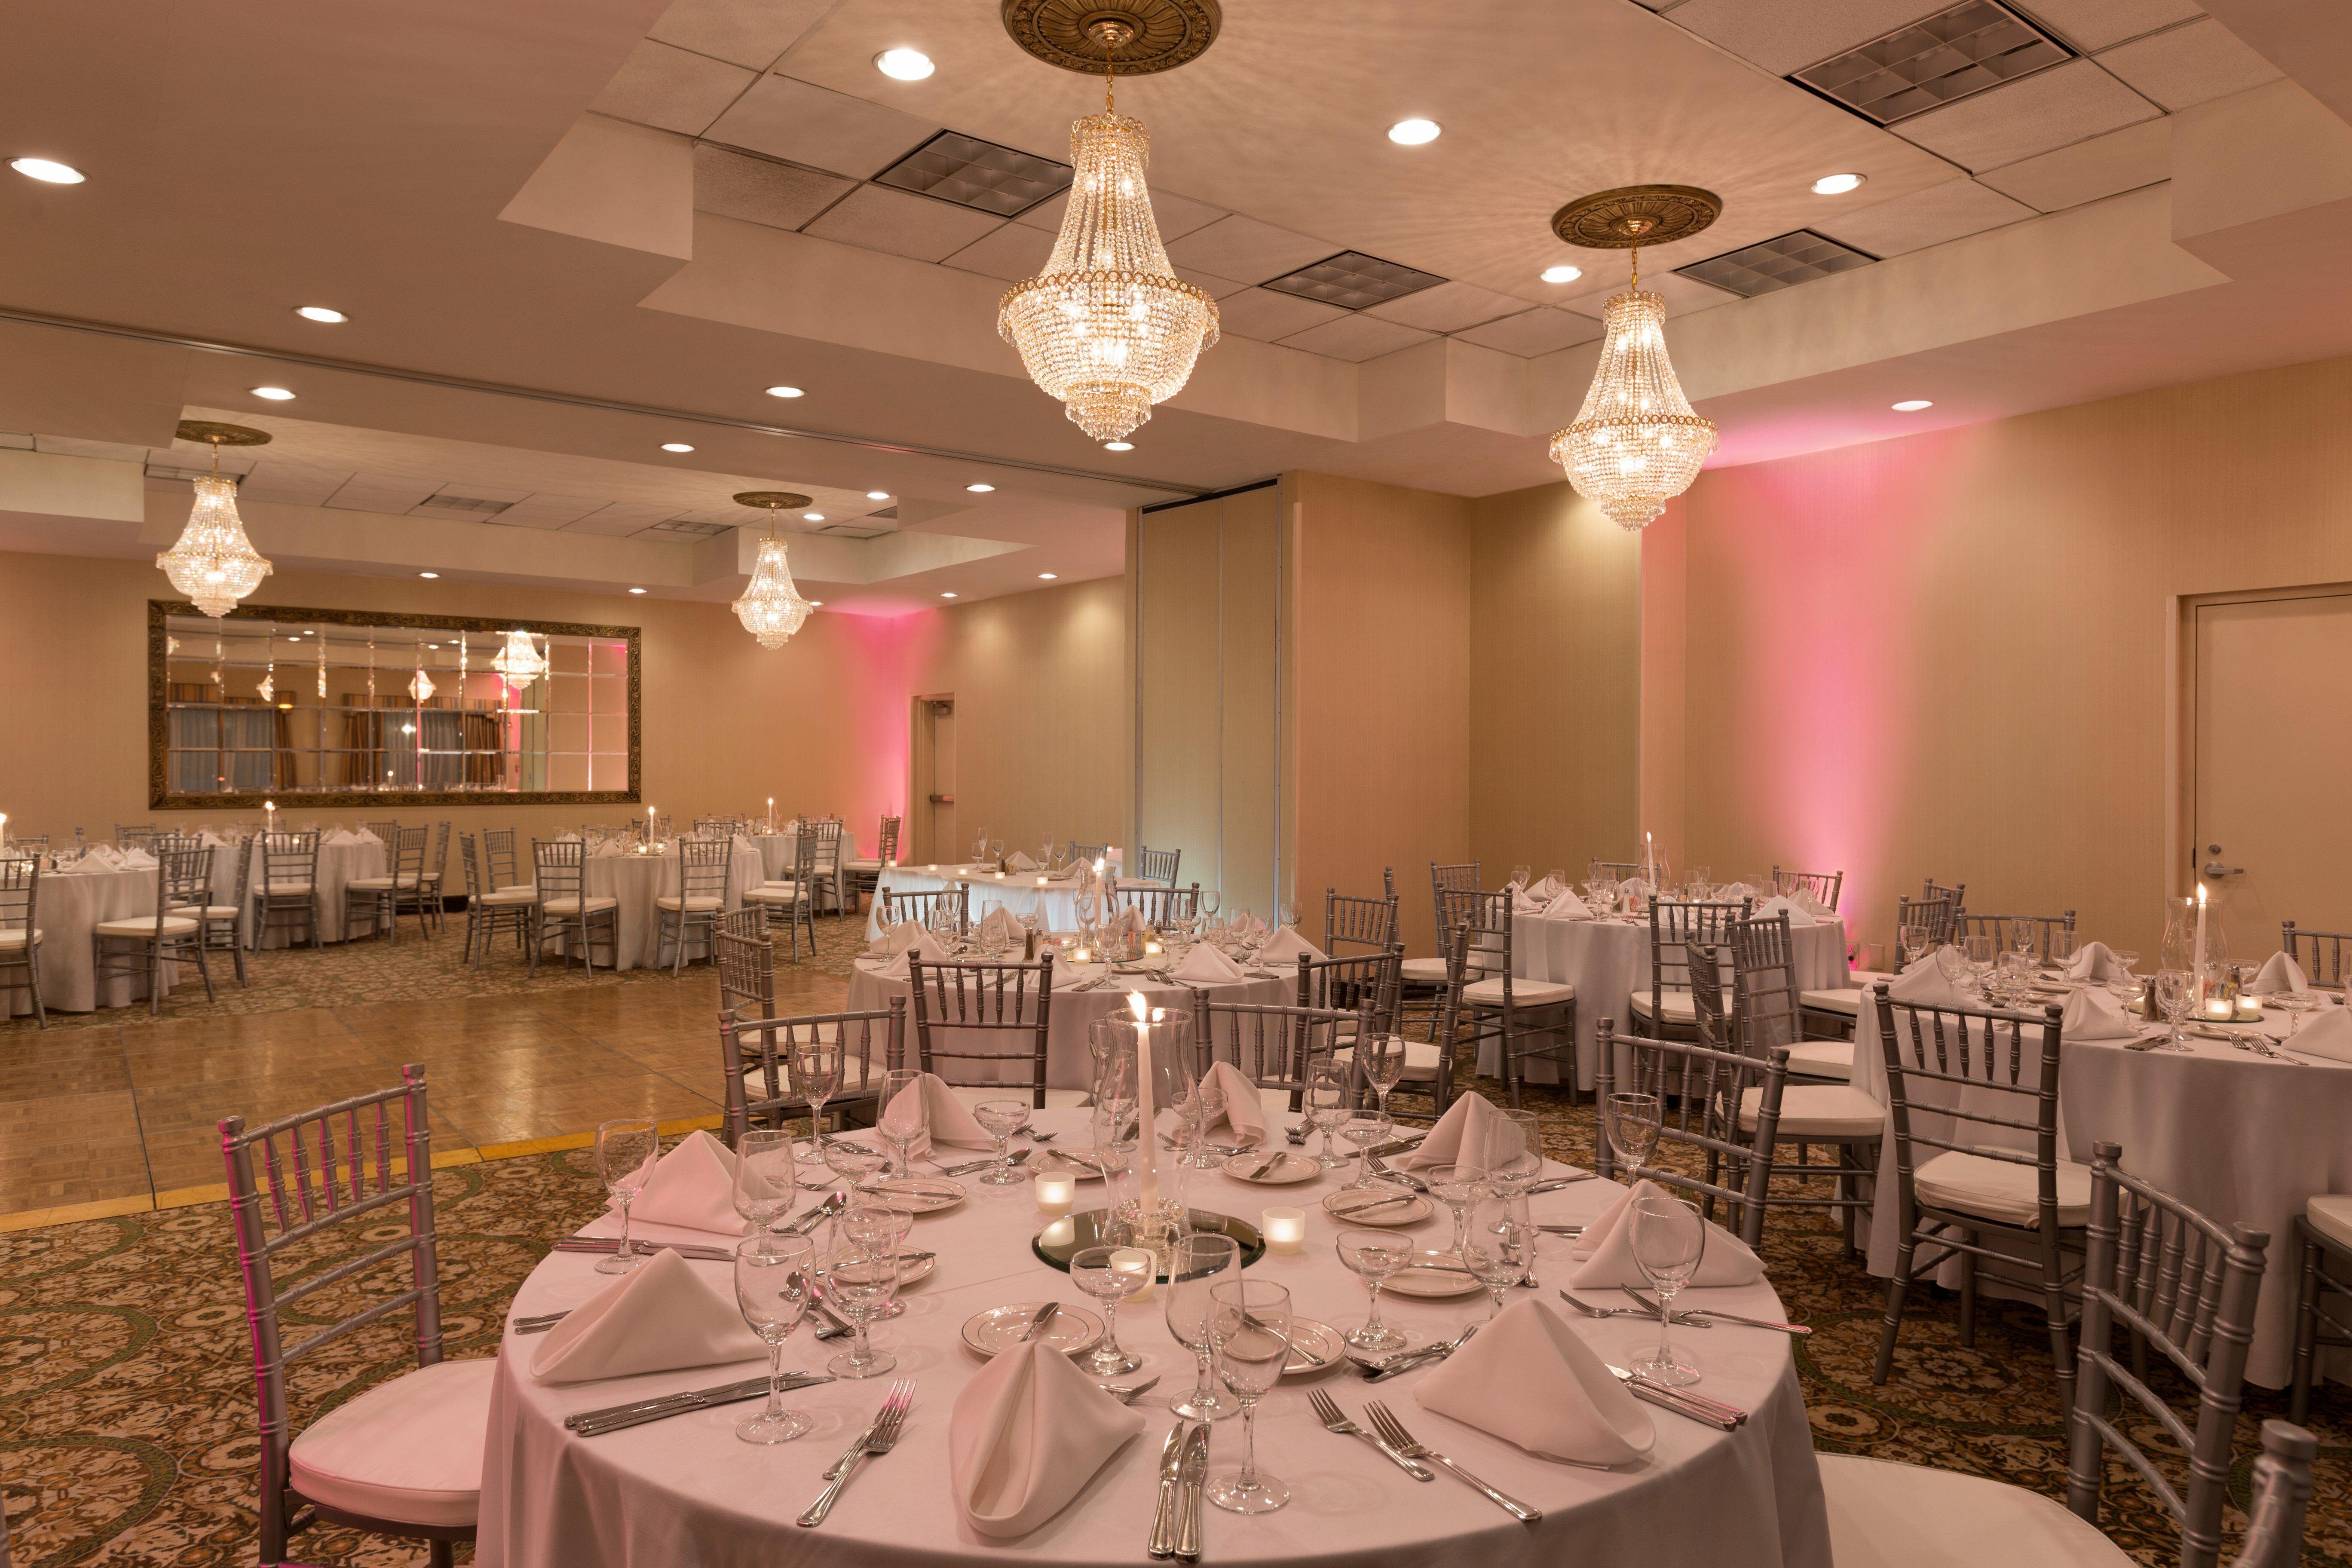 Hilton Garden Inn Fairfax - Unveil